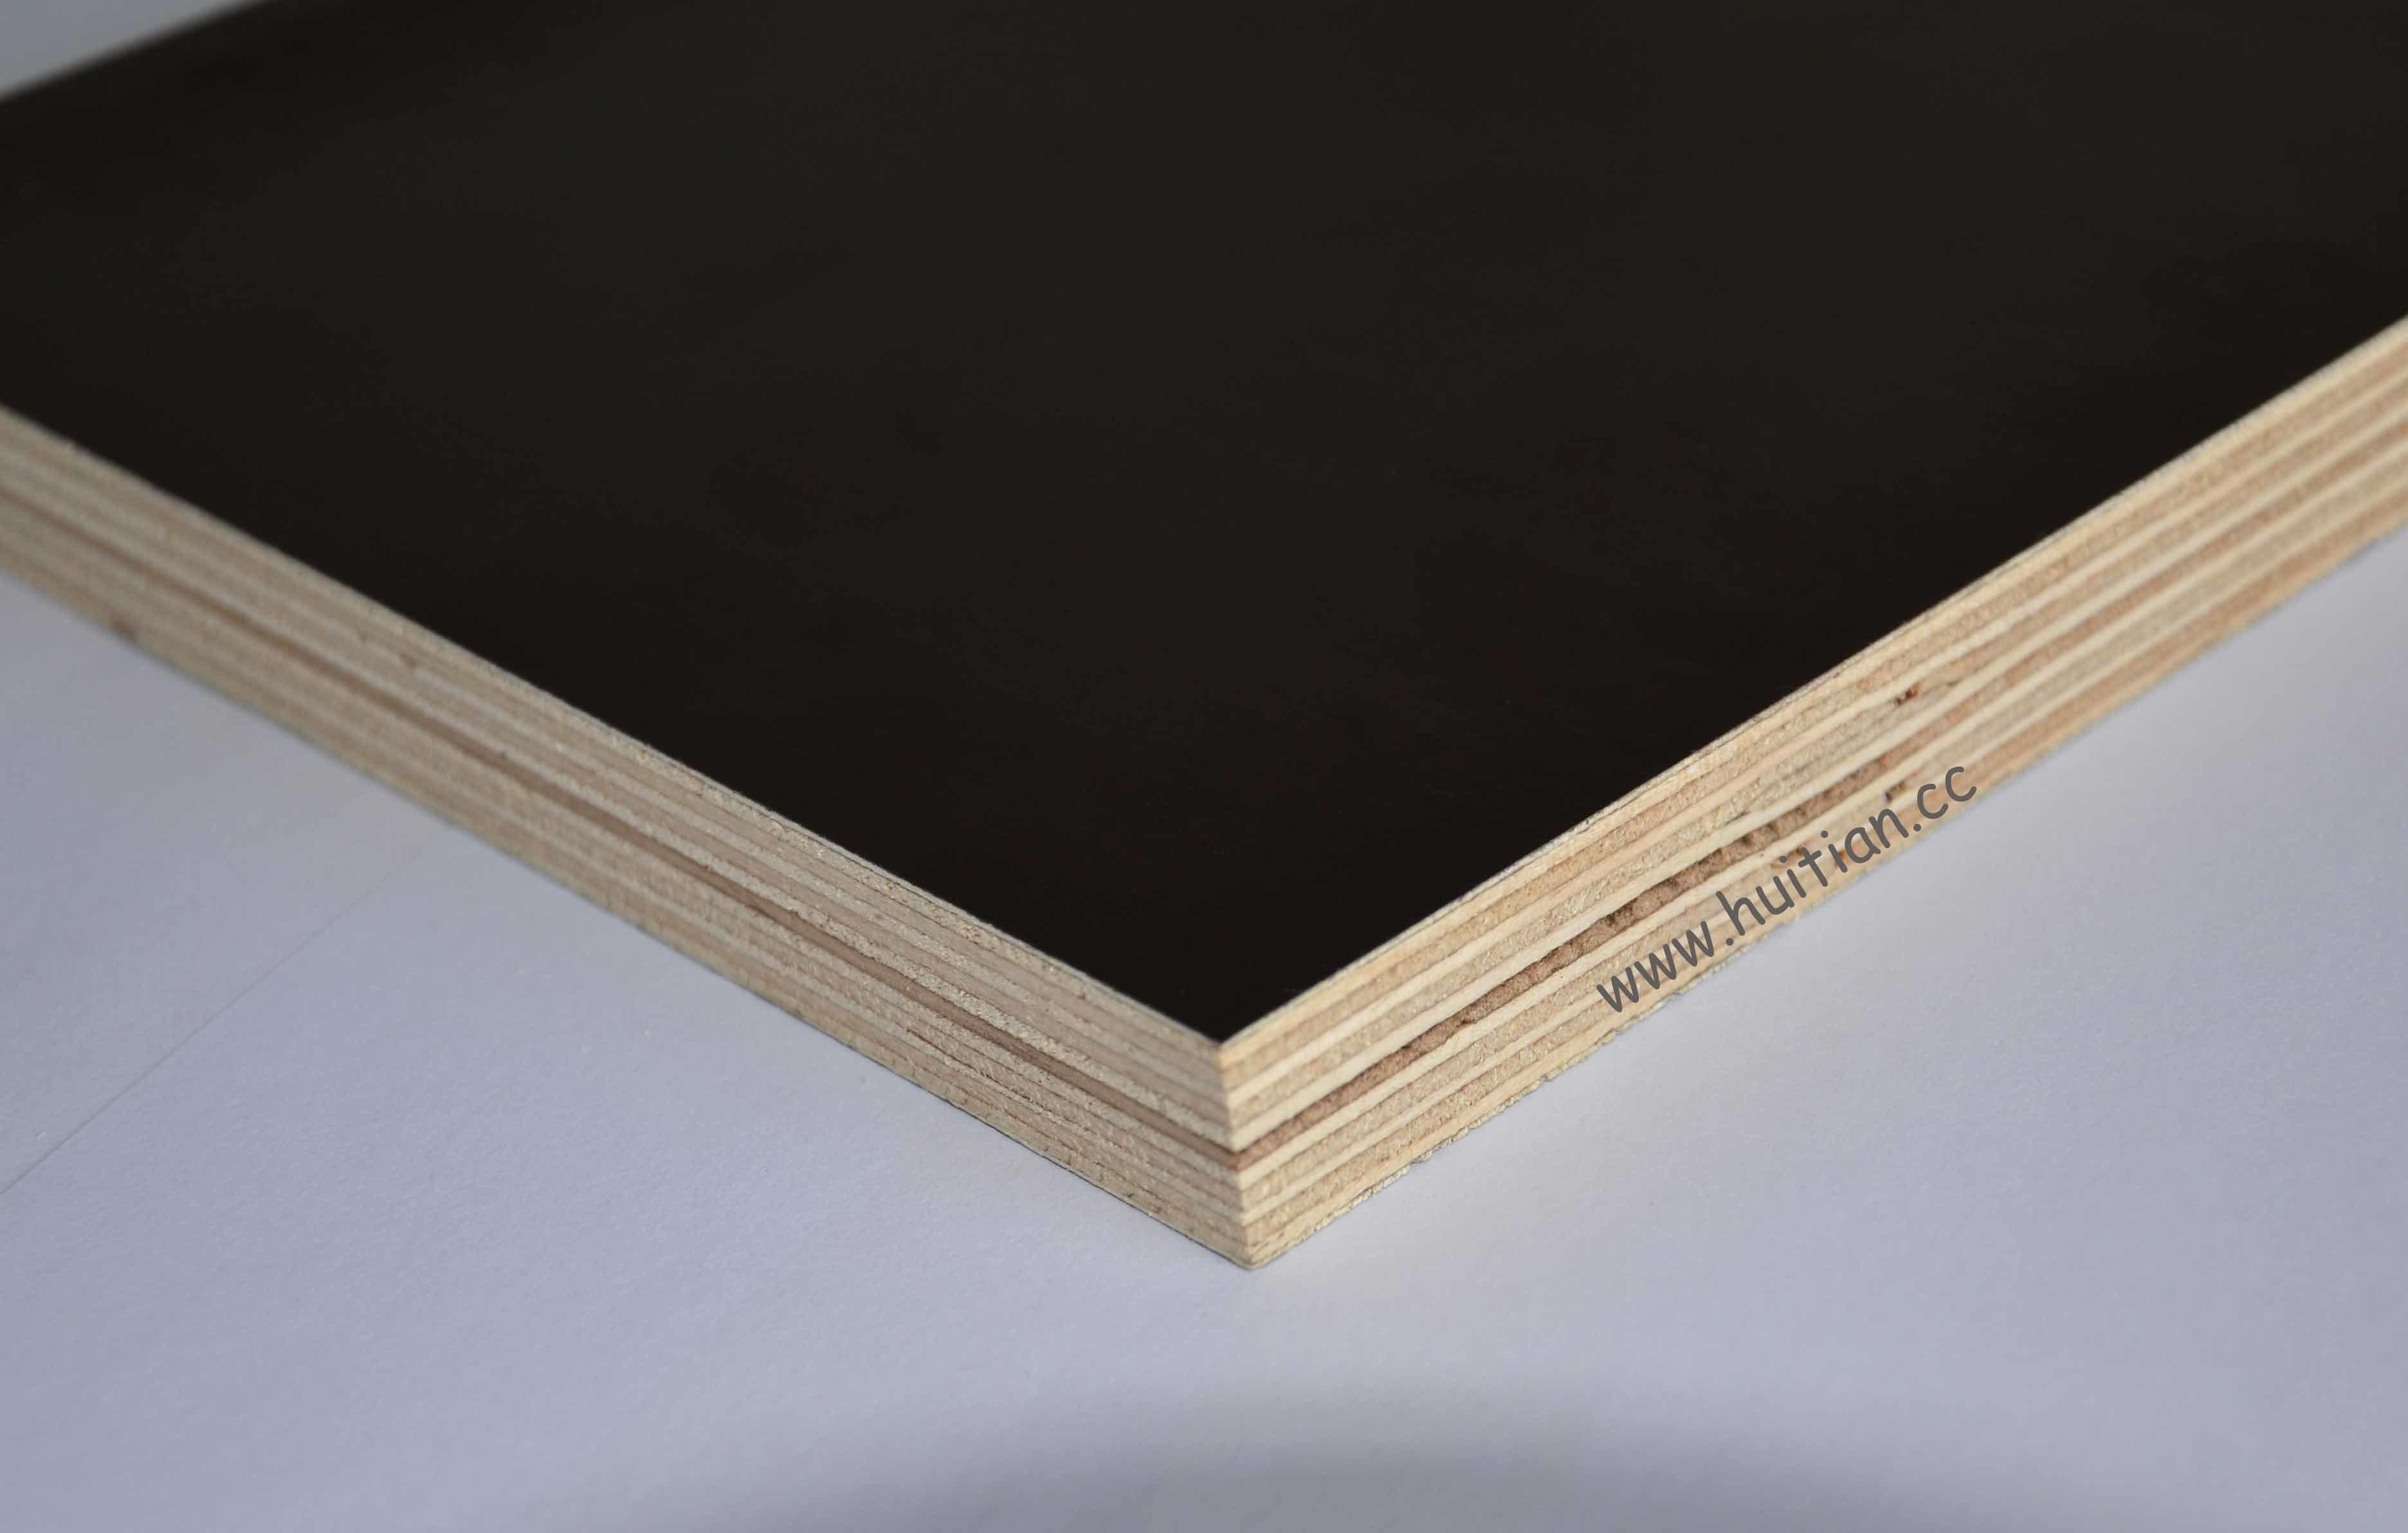 contre plaqu stratifi marin de bouleau contre plaqu. Black Bedroom Furniture Sets. Home Design Ideas